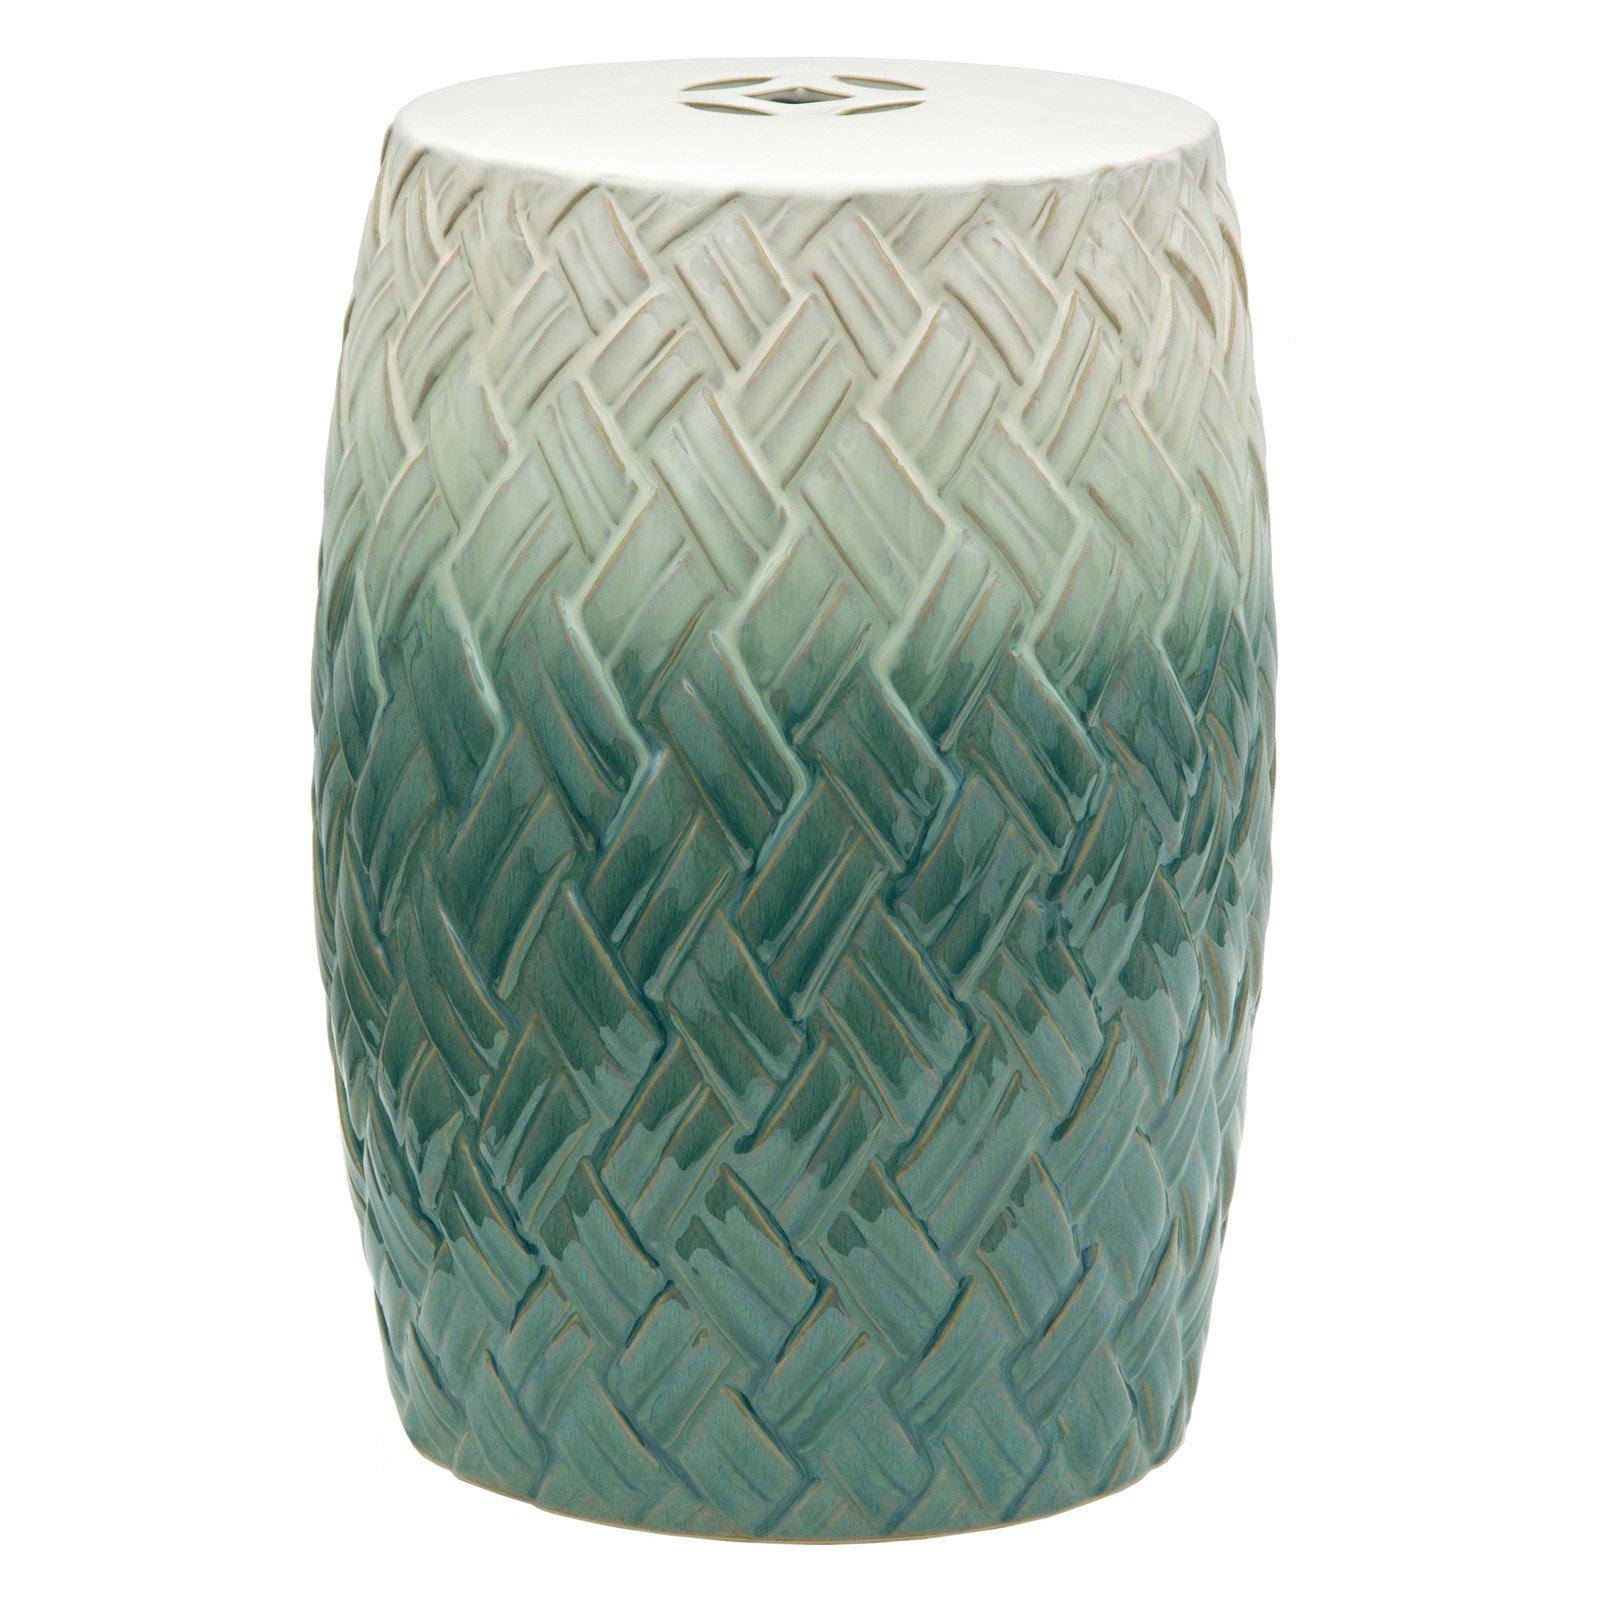 Oriental Furniture Carved Woven Design Porcelain 18 in. Garden Stool